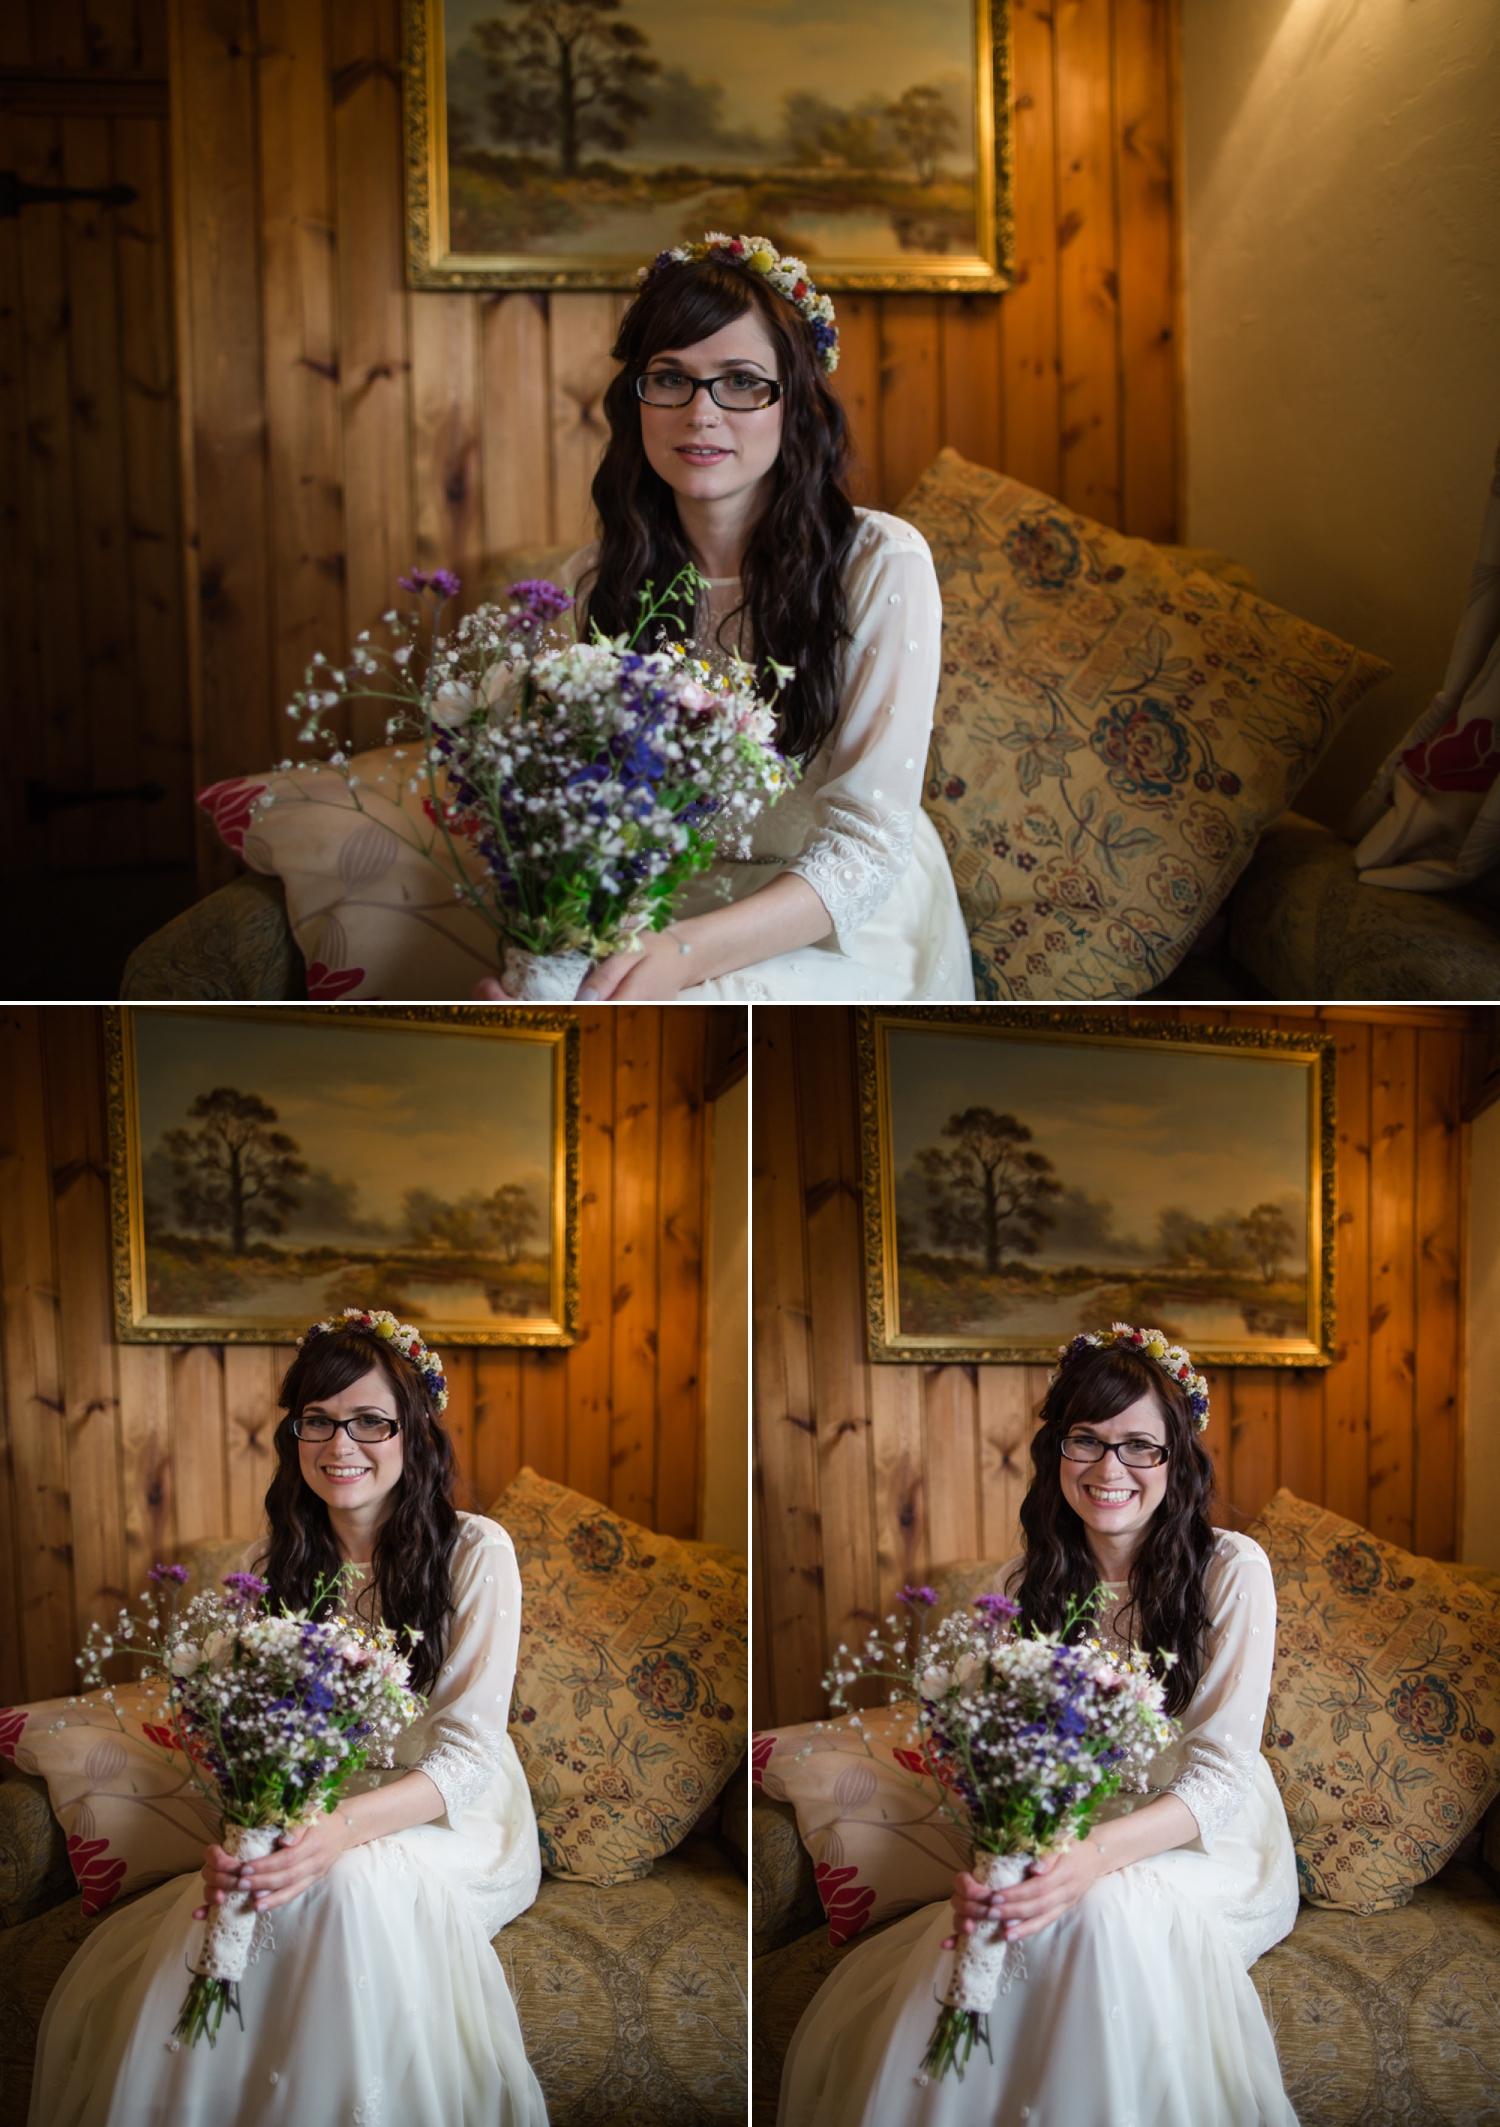 Cheshire Wedding Photographer Elly & Liam_0006